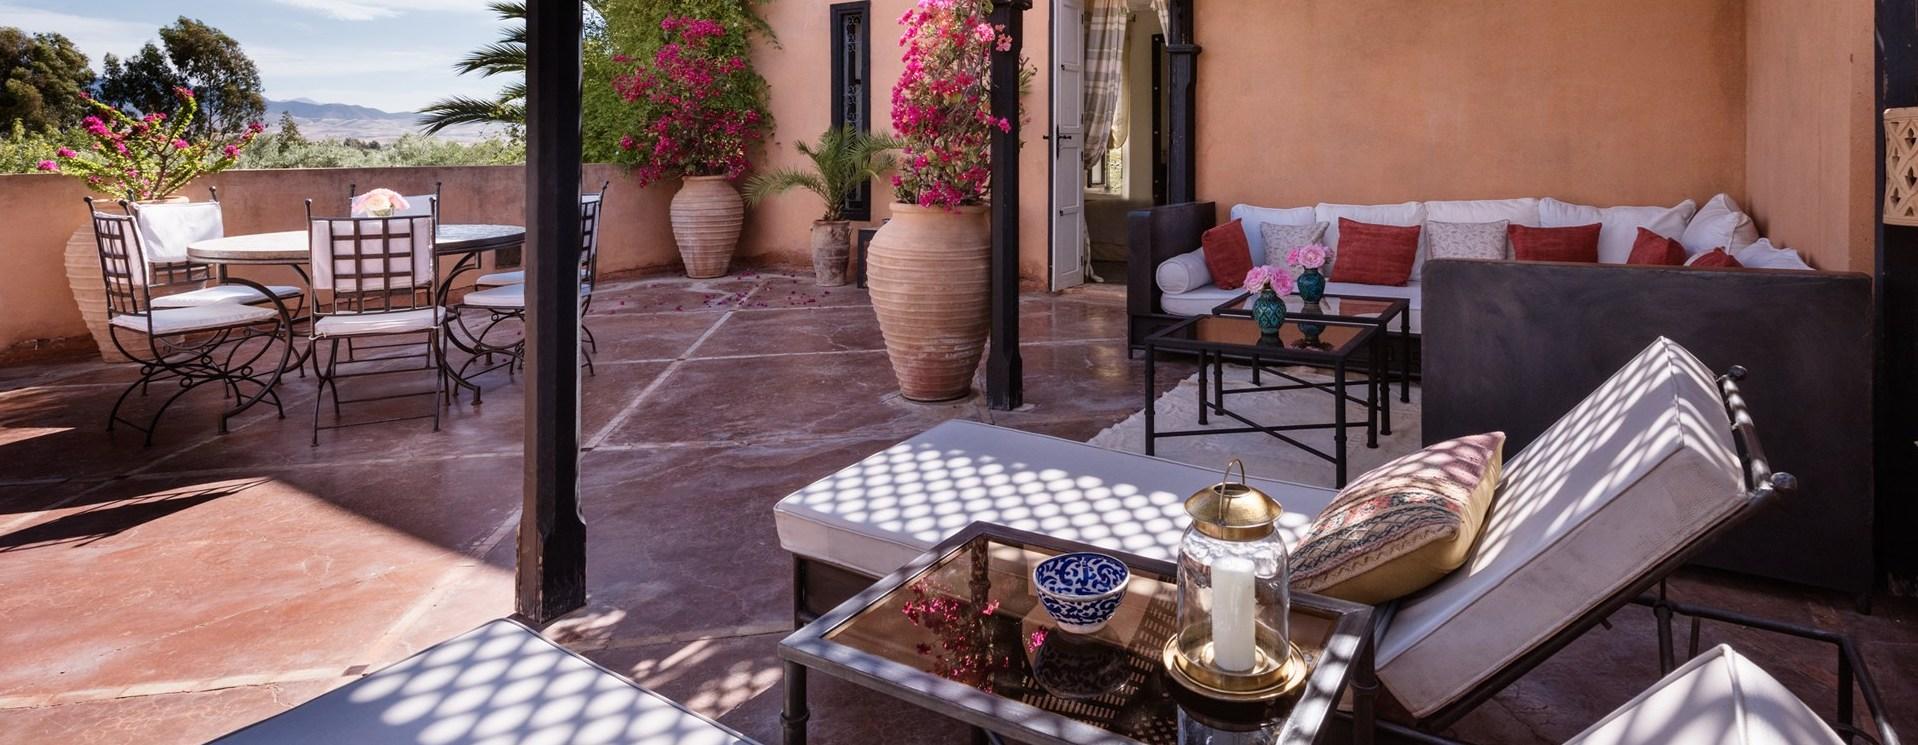 villa-dar-tamazerte-roof-terrace